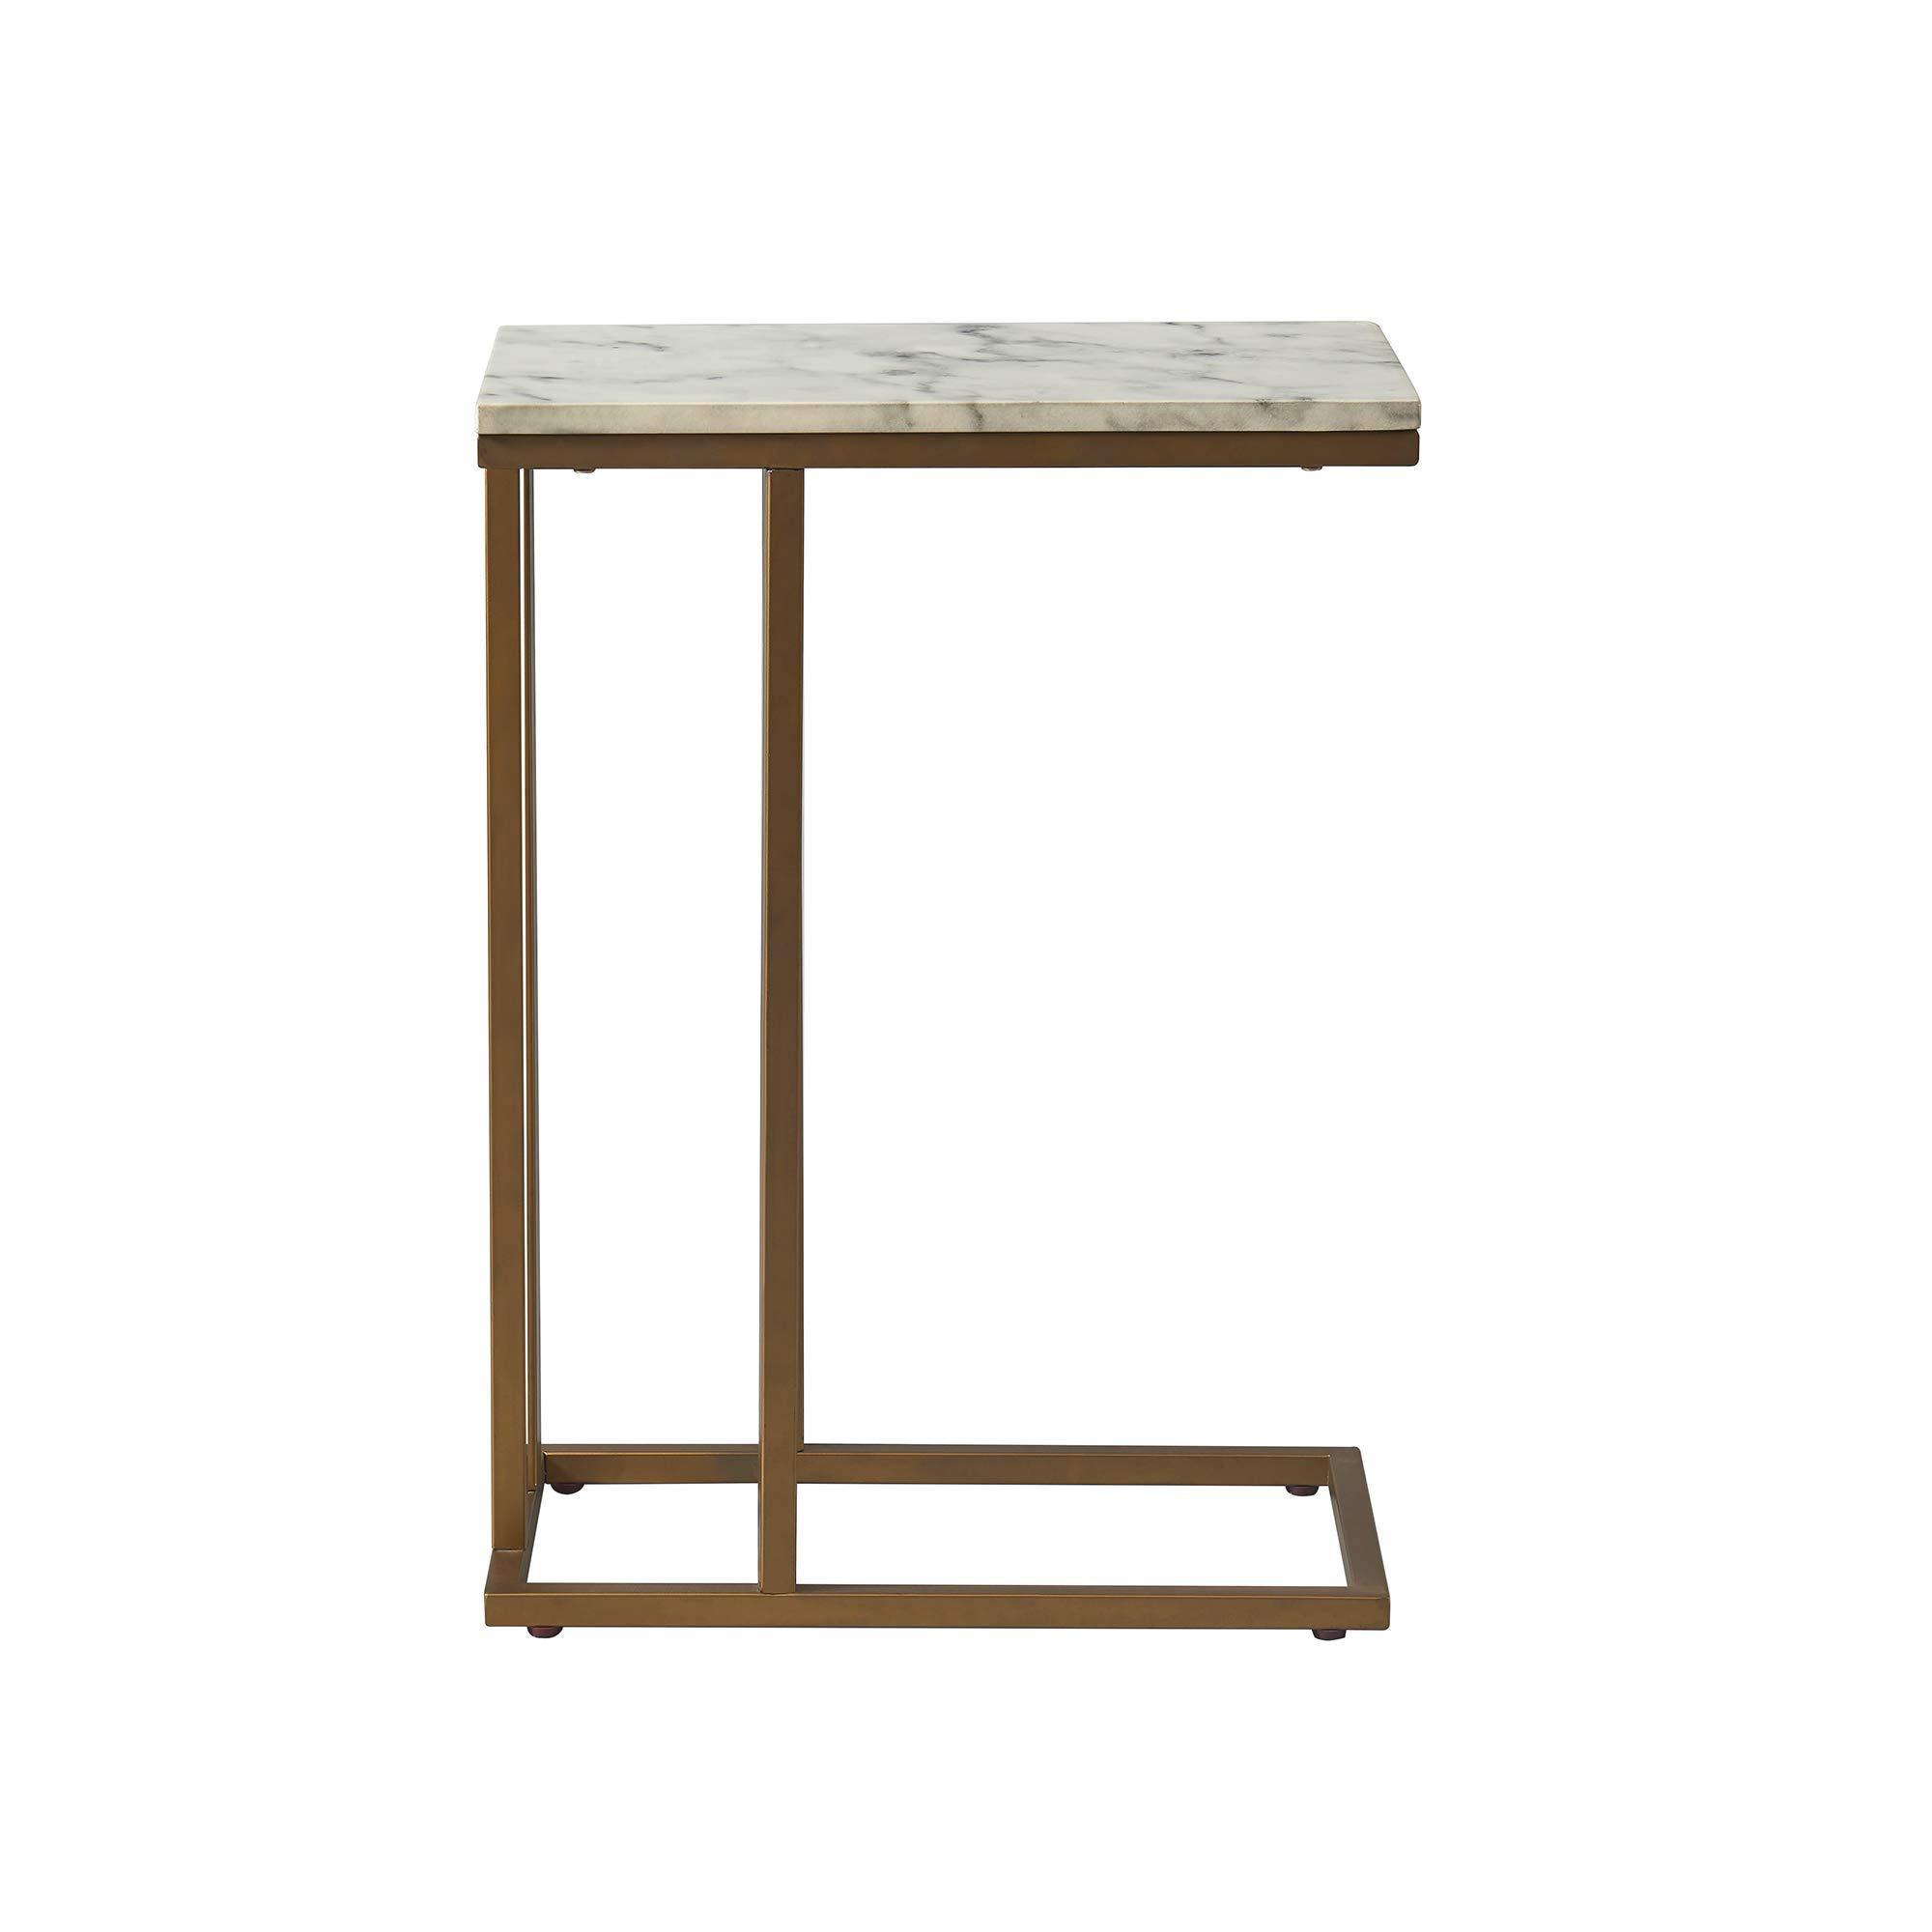 Versanora - Marmo C Shape Table - Faux Marble /Brass by Versanora (Image #11)